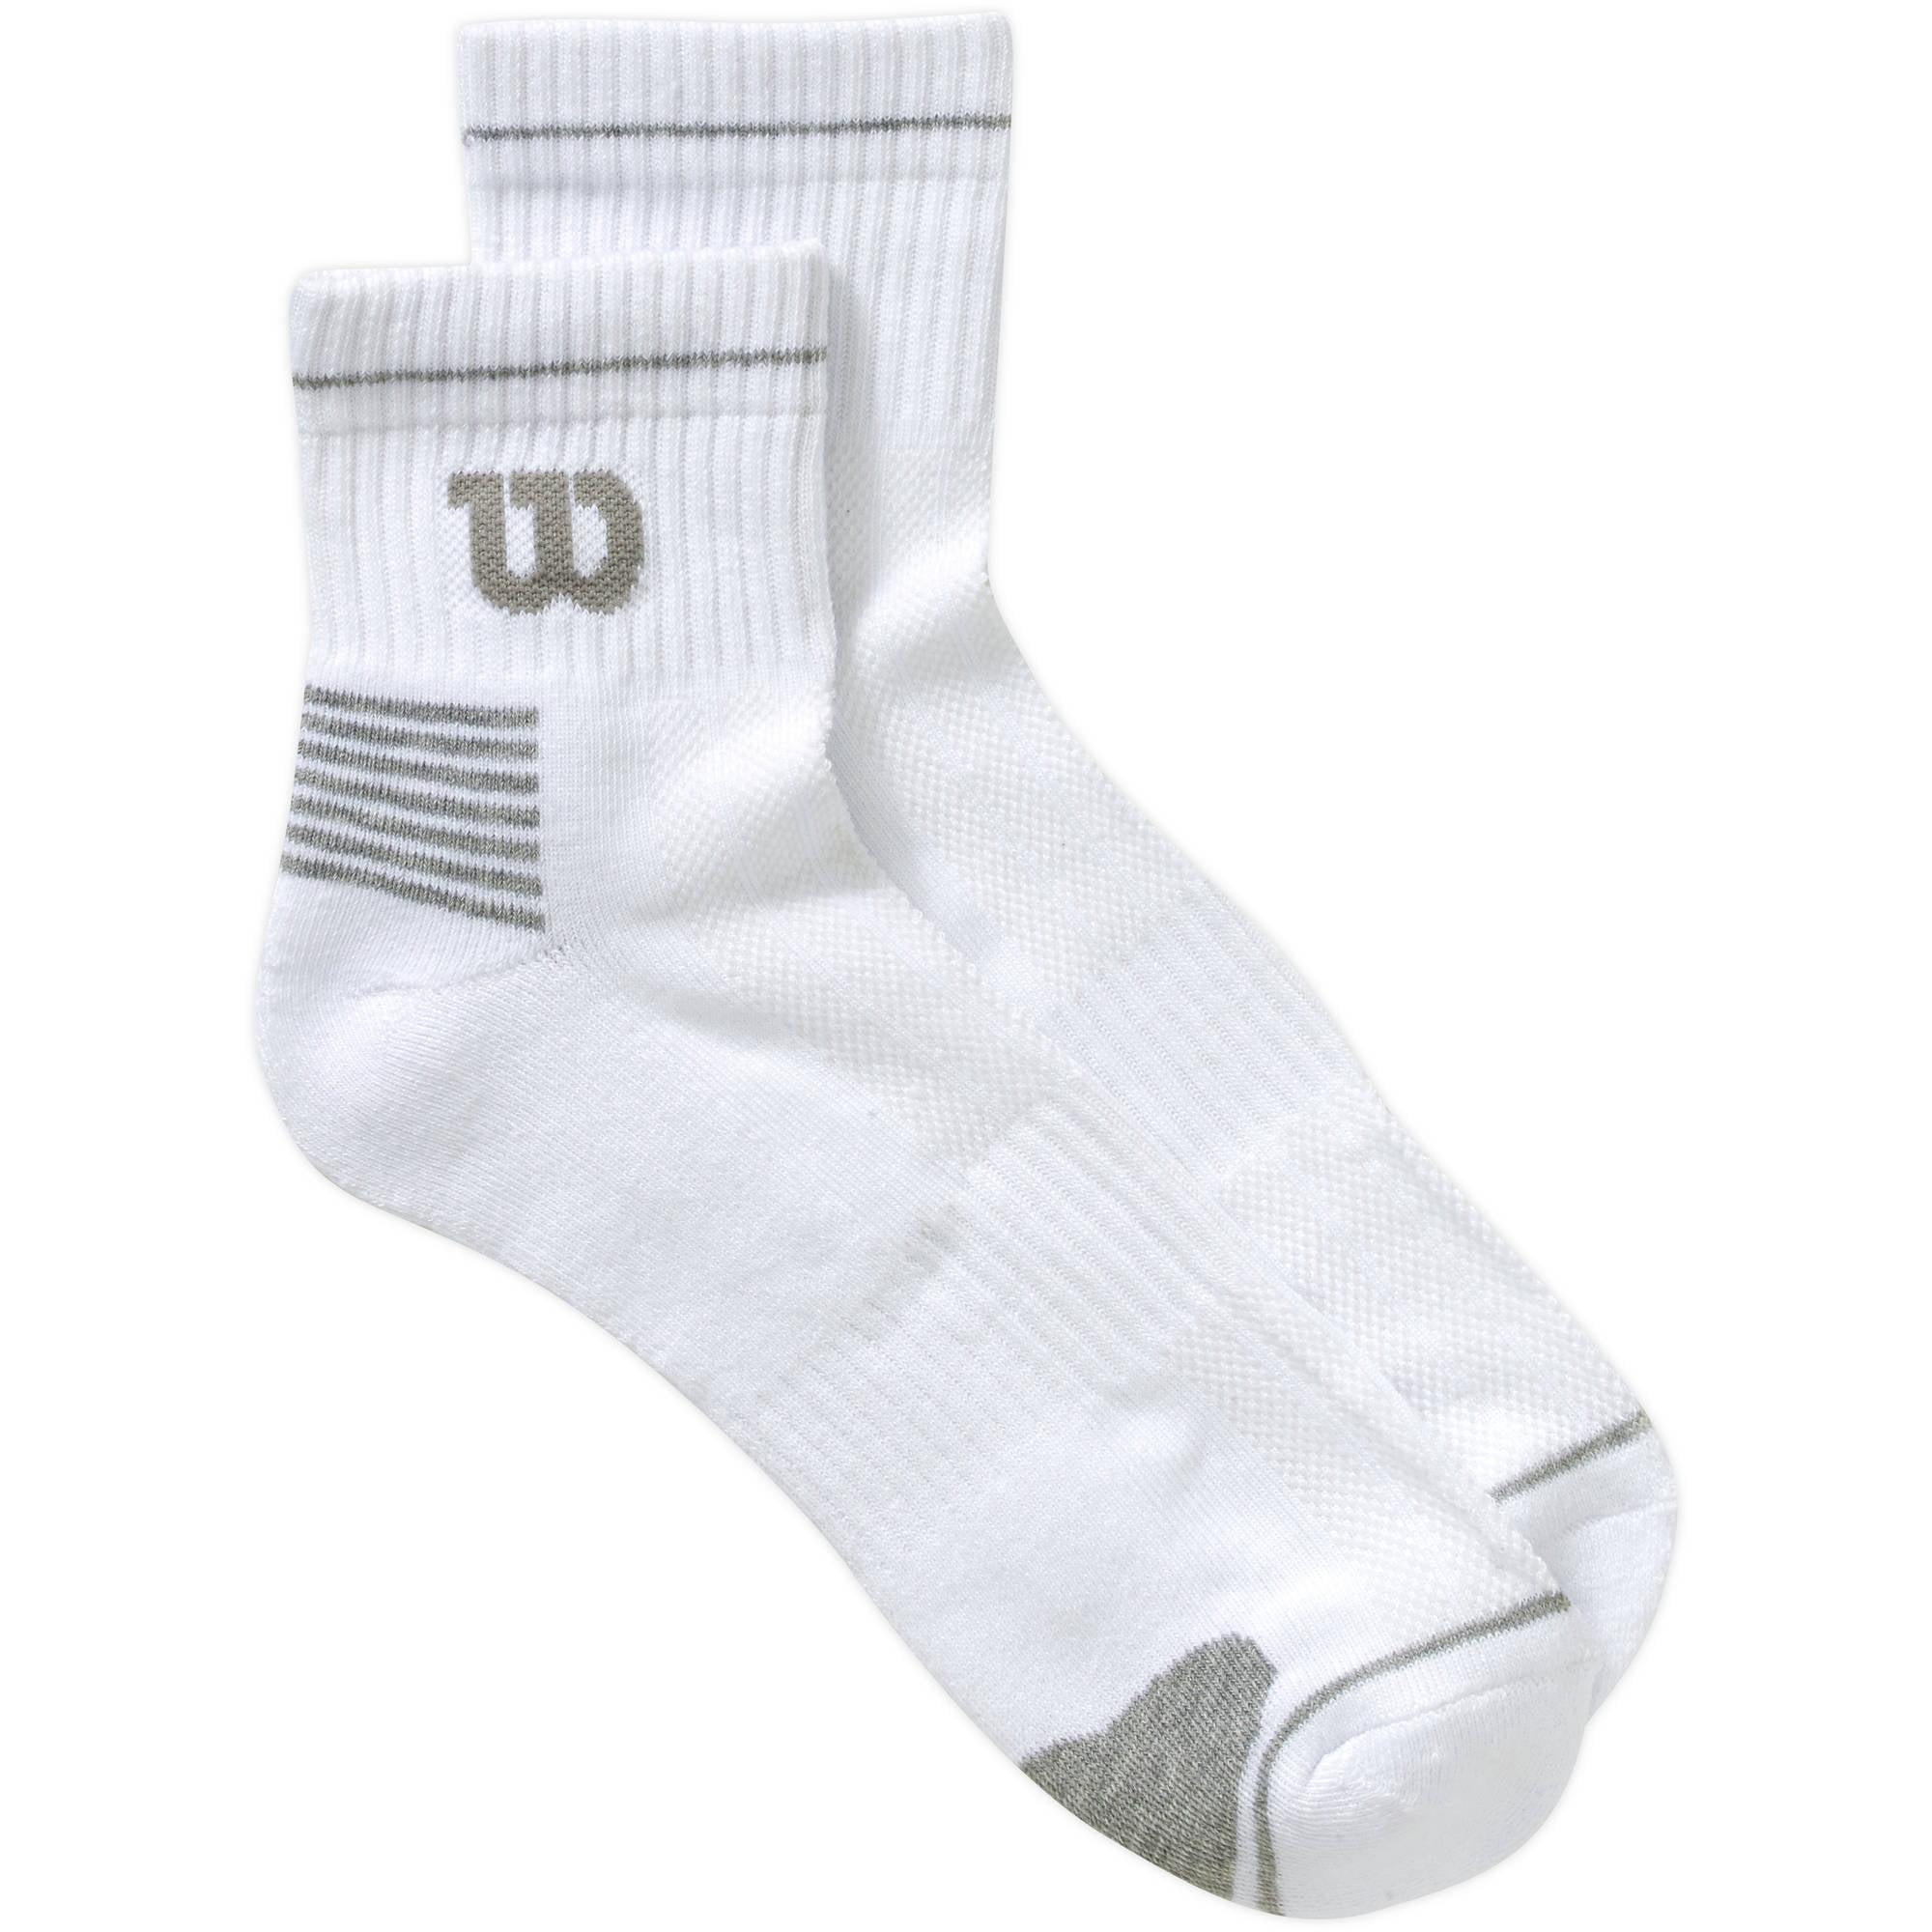 Wilson - 6 Pack Men s Performance Quarter Top Sock - Walmart.com 77e8f1a53e